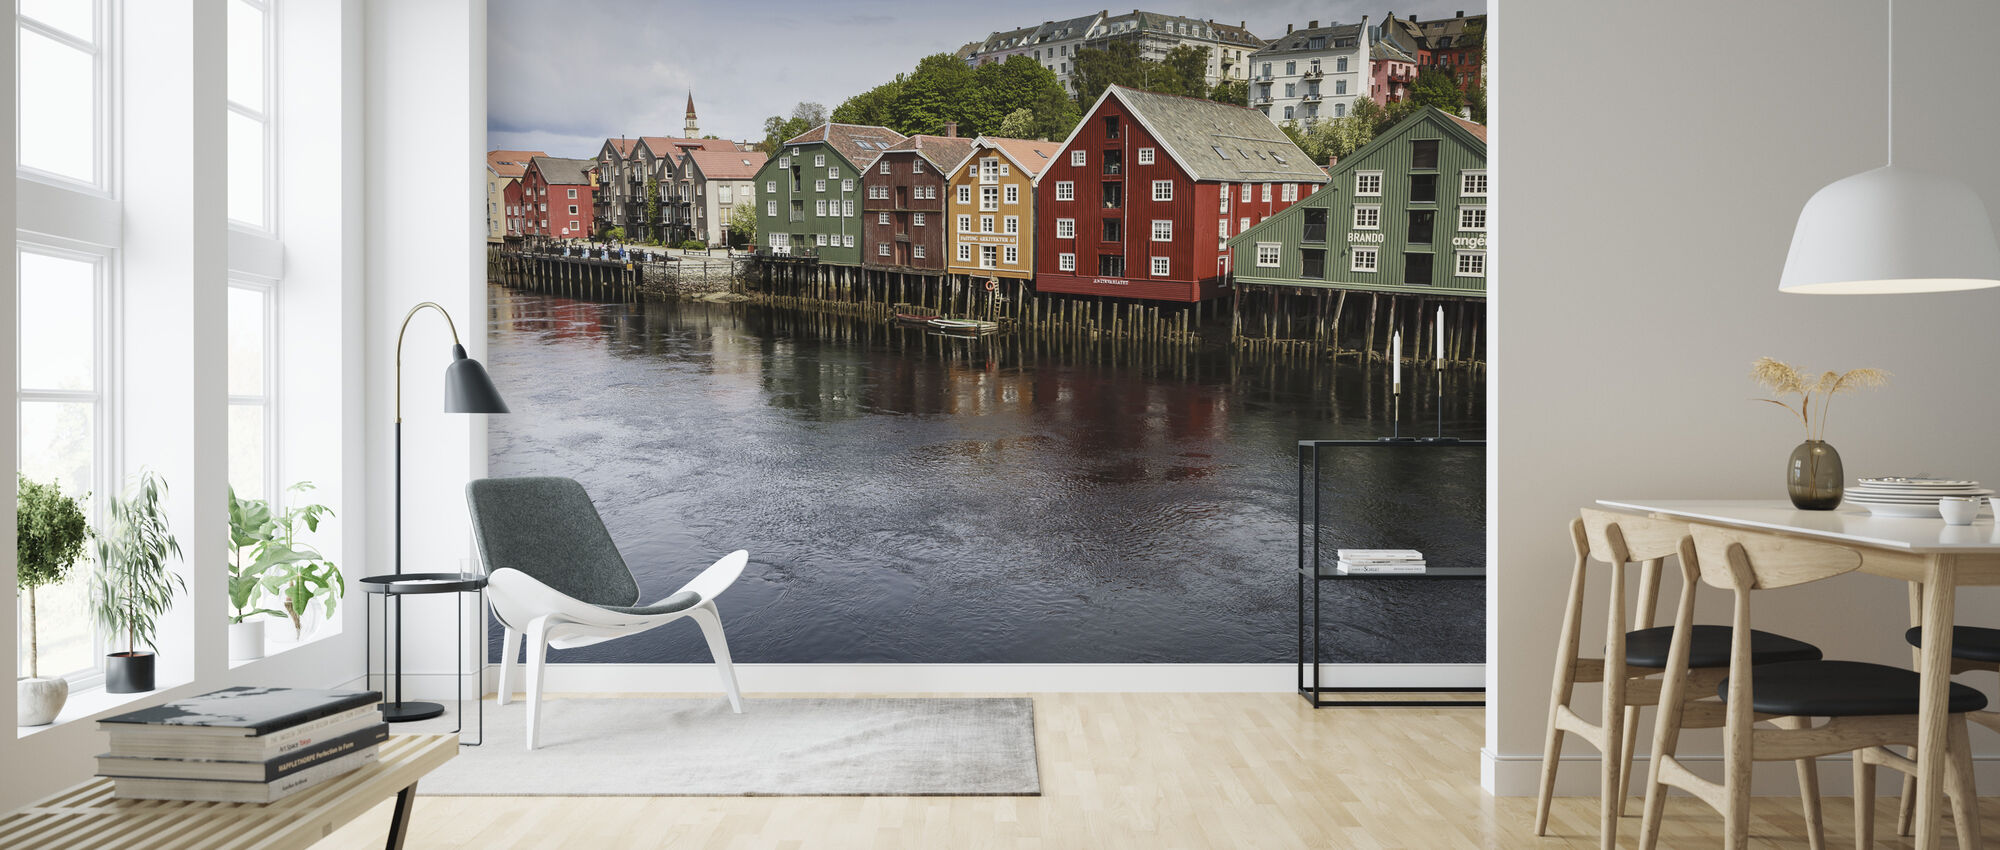 Trondheim - Wallpaper - Living Room